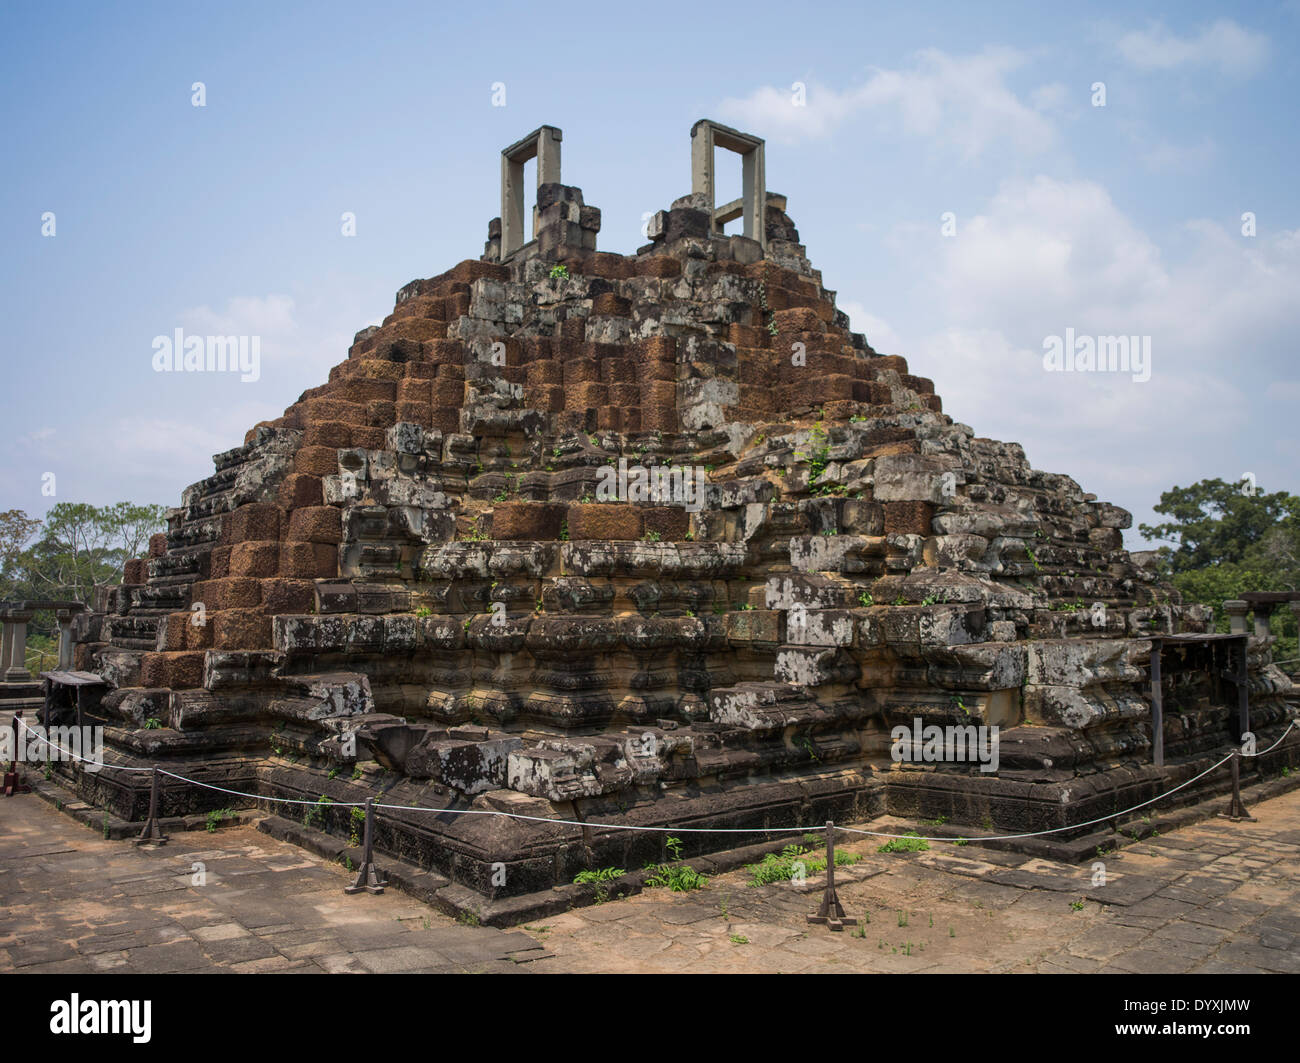 Baphon Tempel innerhalb der Mauern von Angkor Thom, Siem Reap, Kambodscha Stockbild